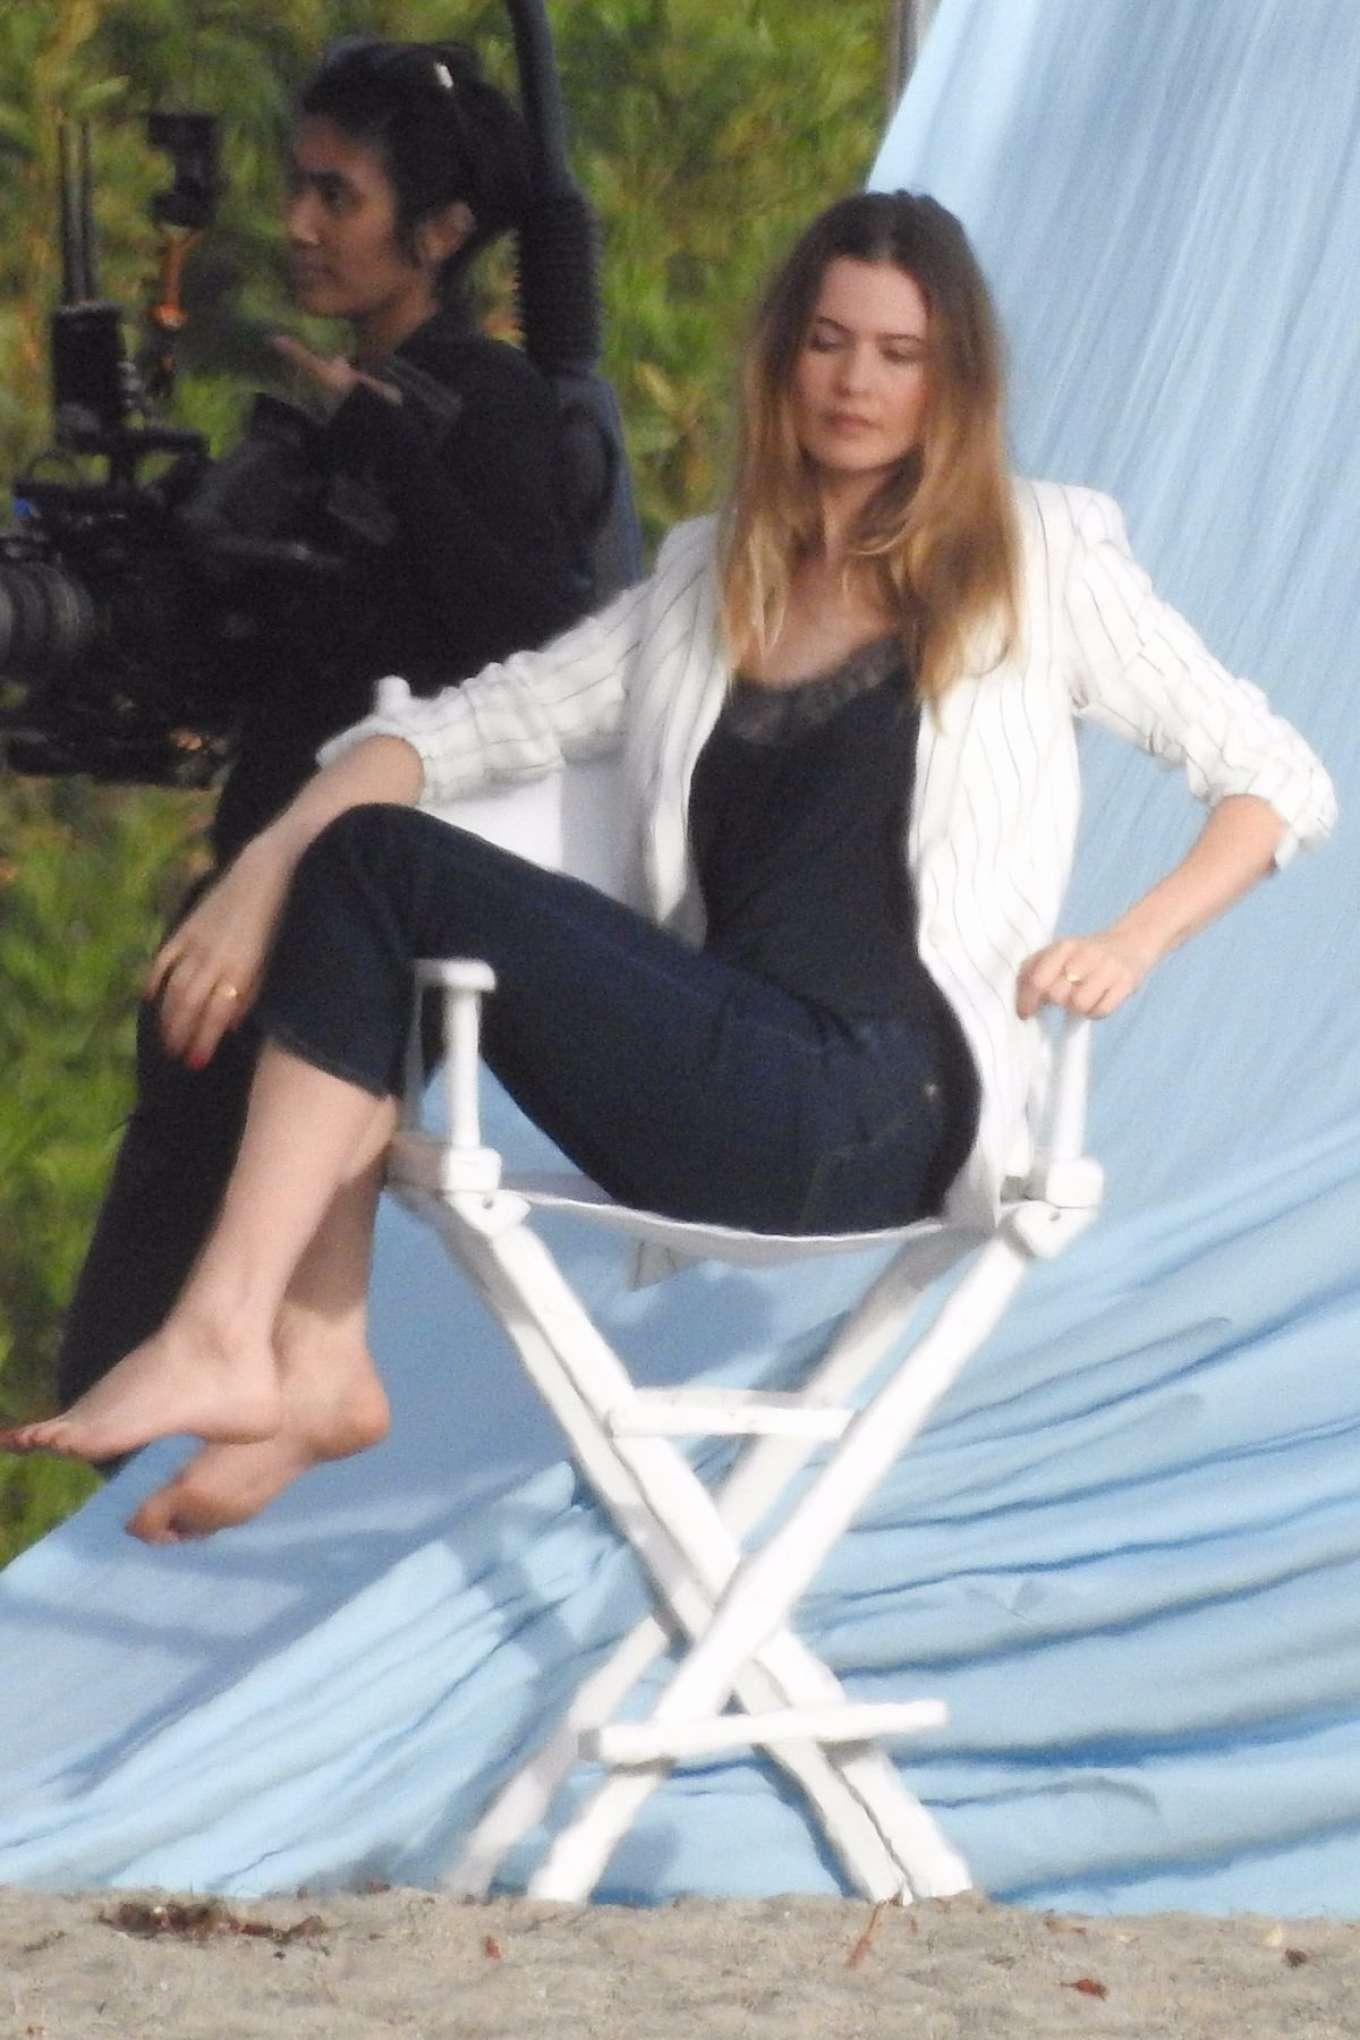 Behati Prinsloo - On the set of a photoshoot in Malibu